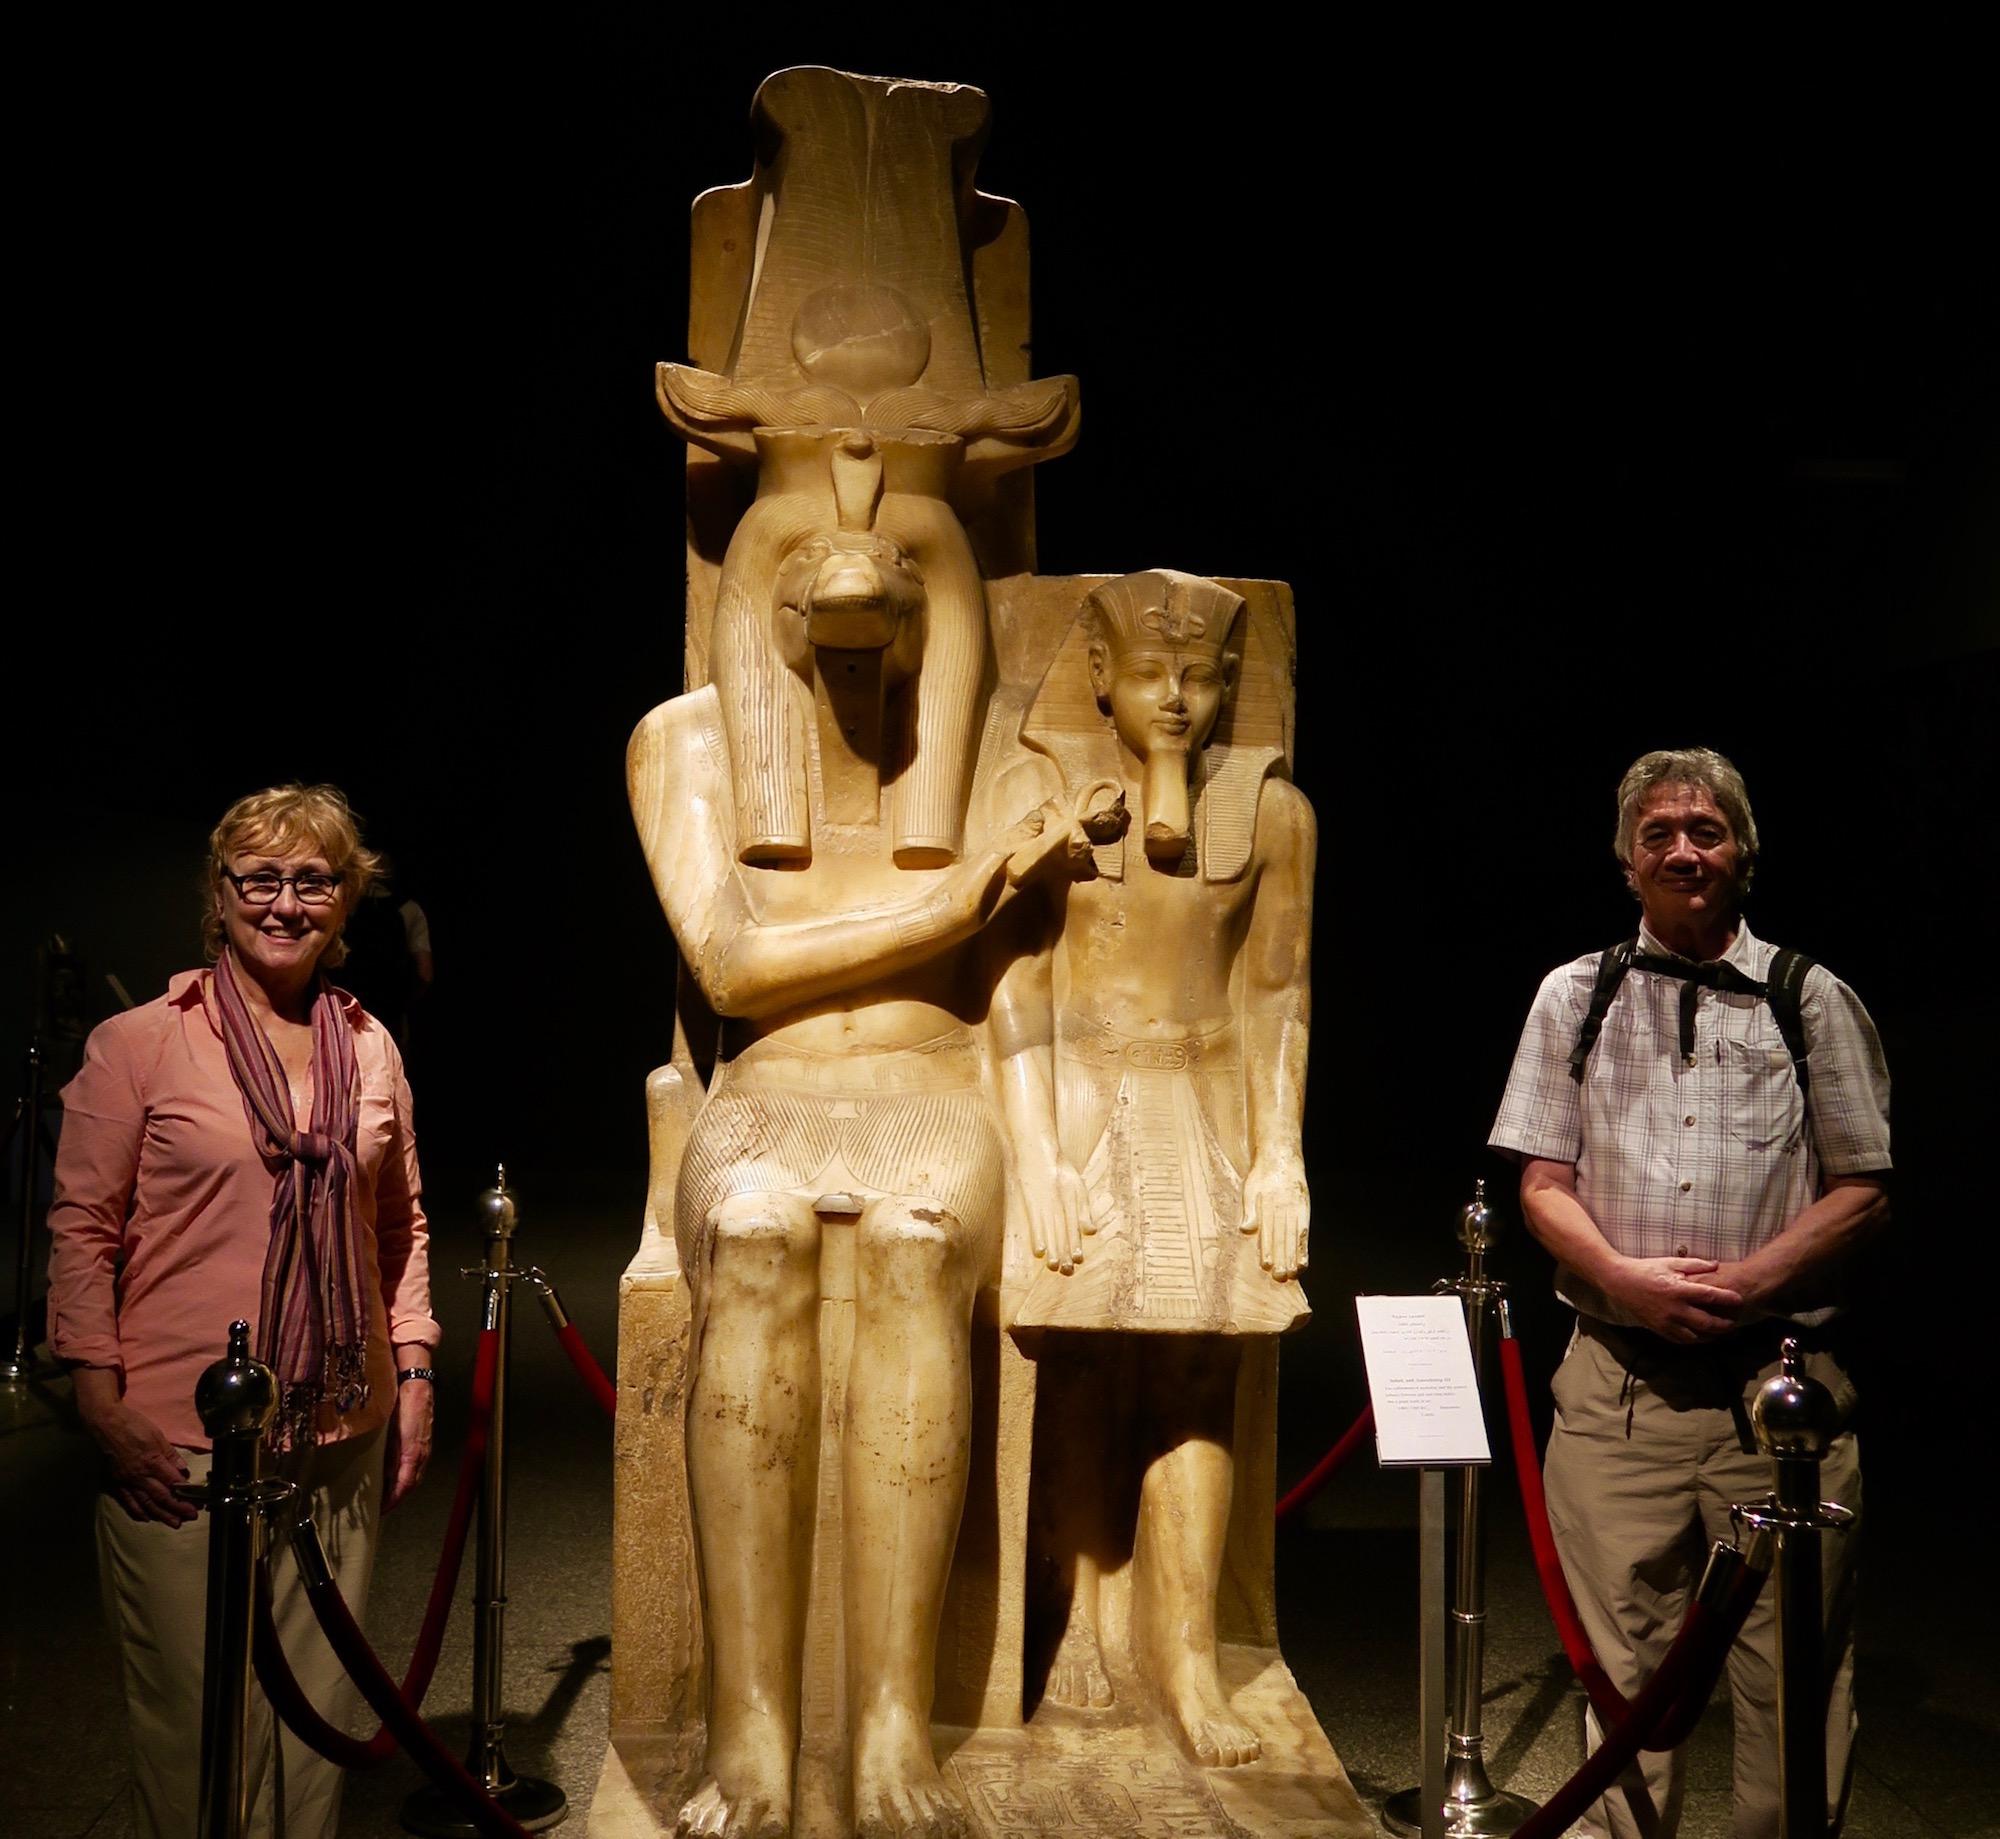 With Sobek & Amenhotep III, Luxor Museum